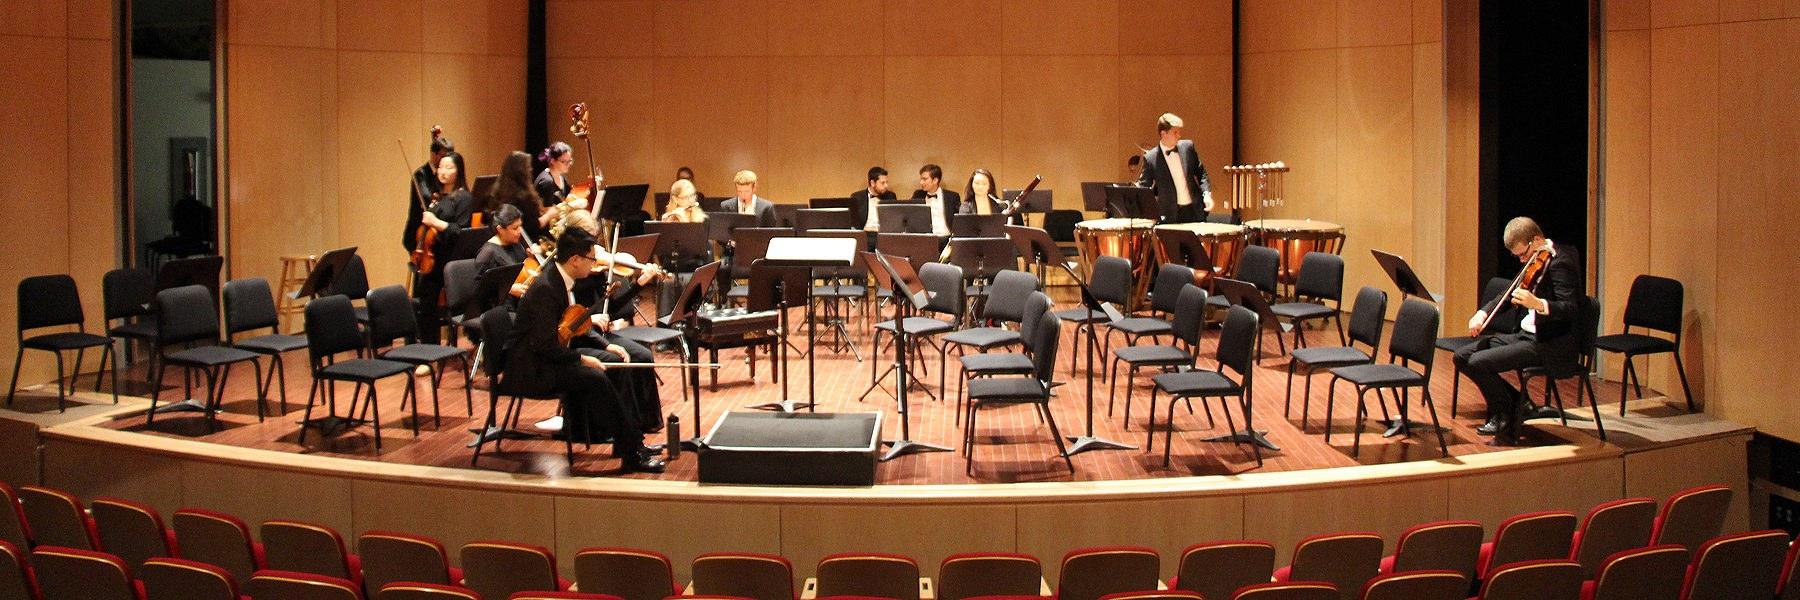 Orford Musique Salle Reception